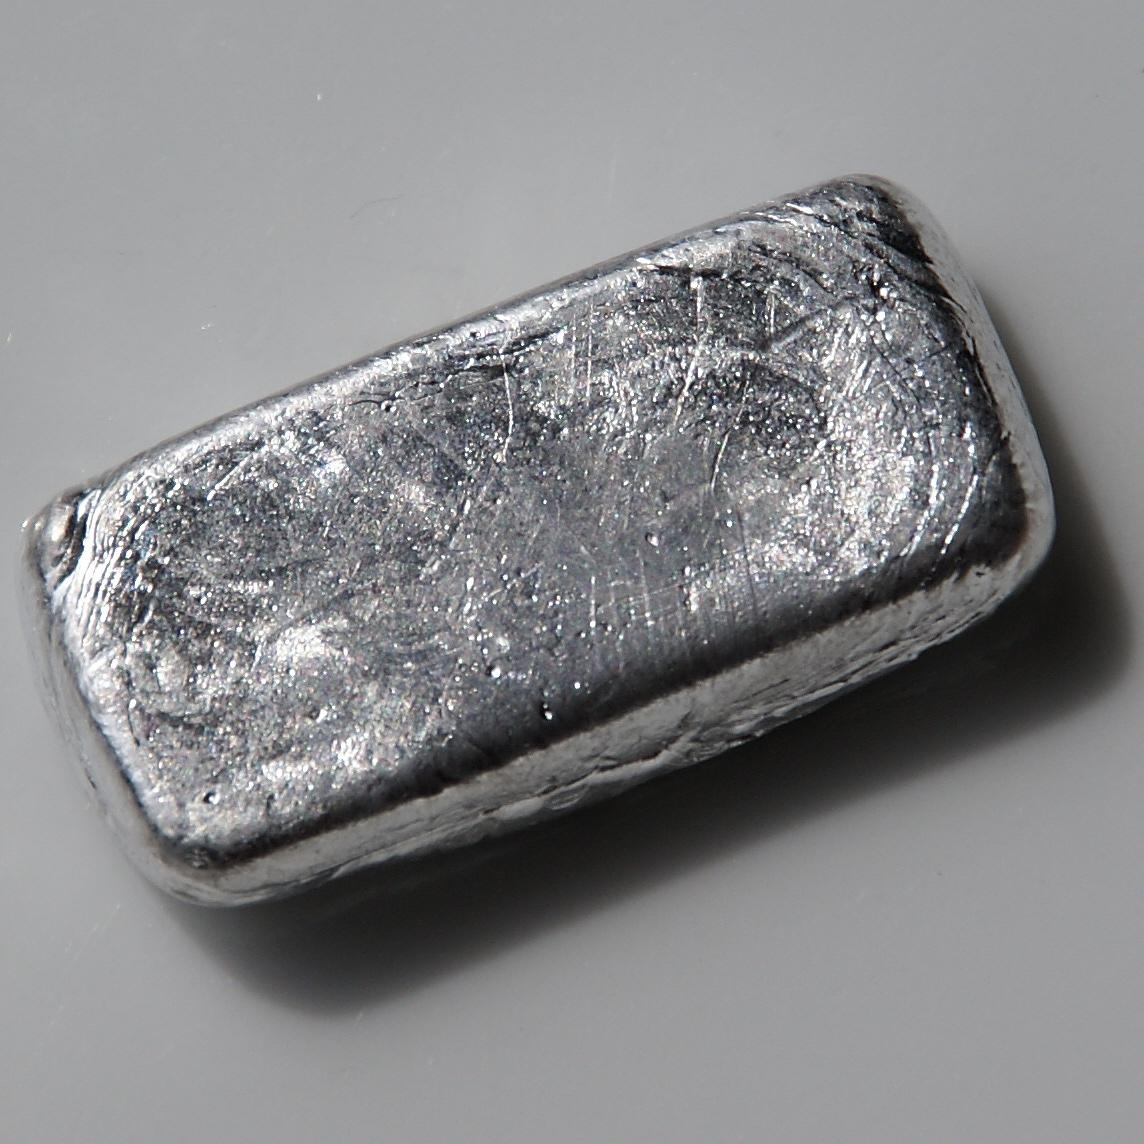 File:Ingot of 40 grams of indium.jpg - Wikimedia Commons